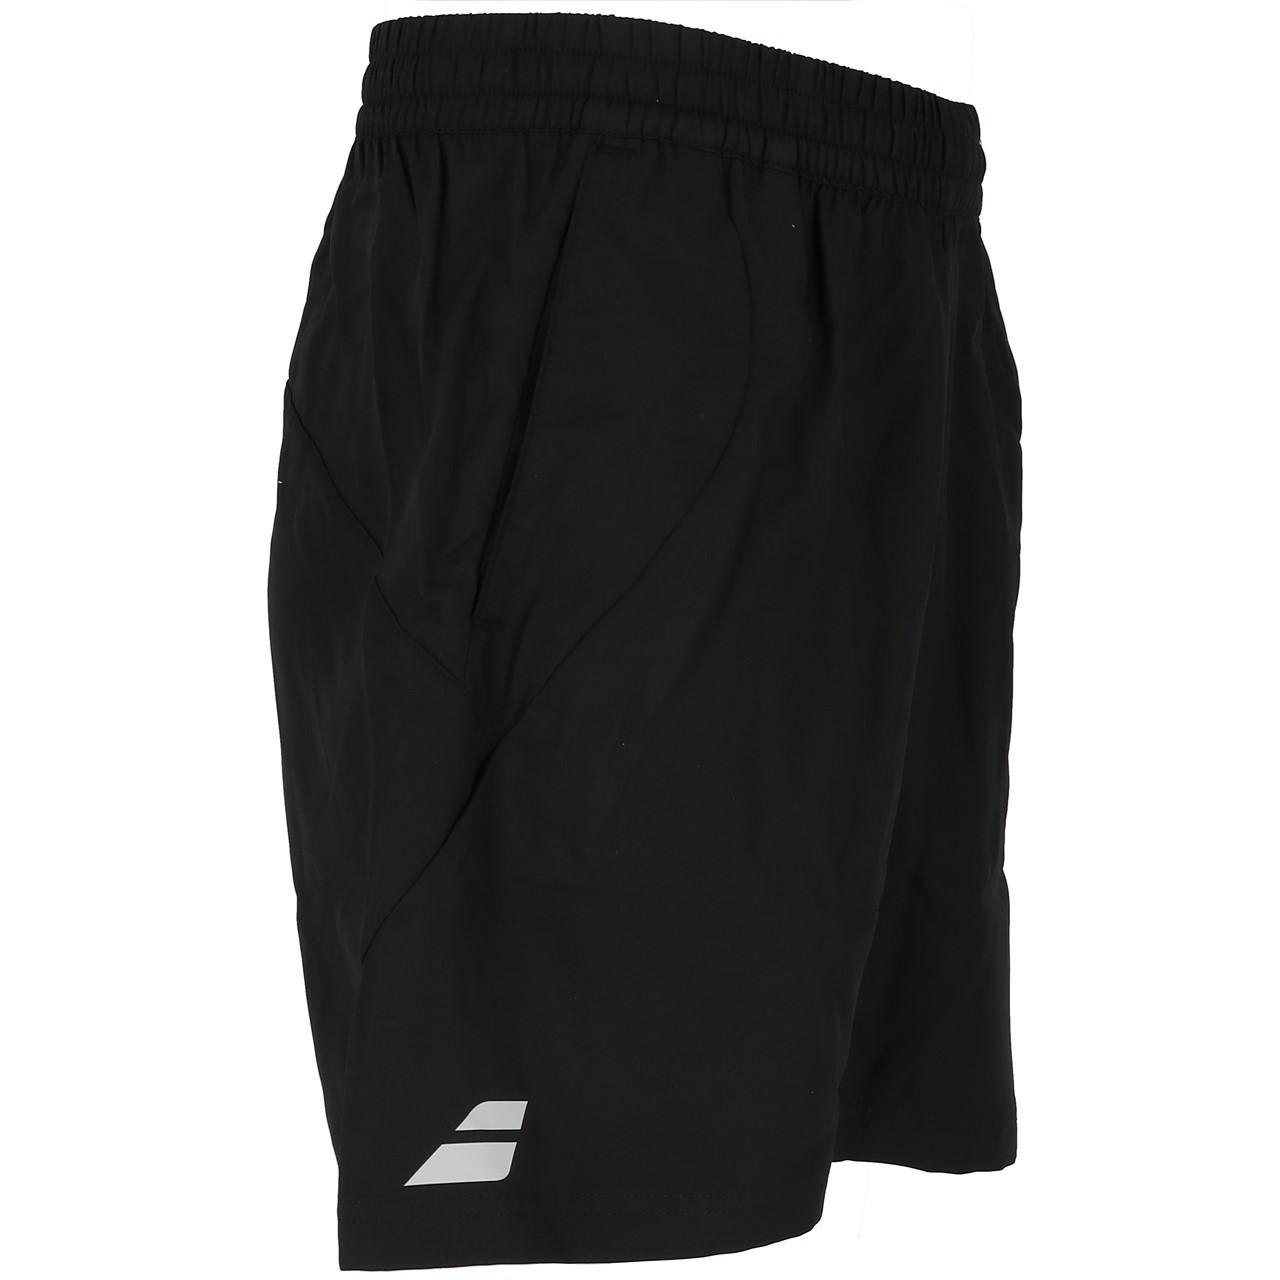 short-Tennis-Babolat-Core-Shorts-8-Men-Schwarz-Schwarz-71700-Neu Indexbild 4